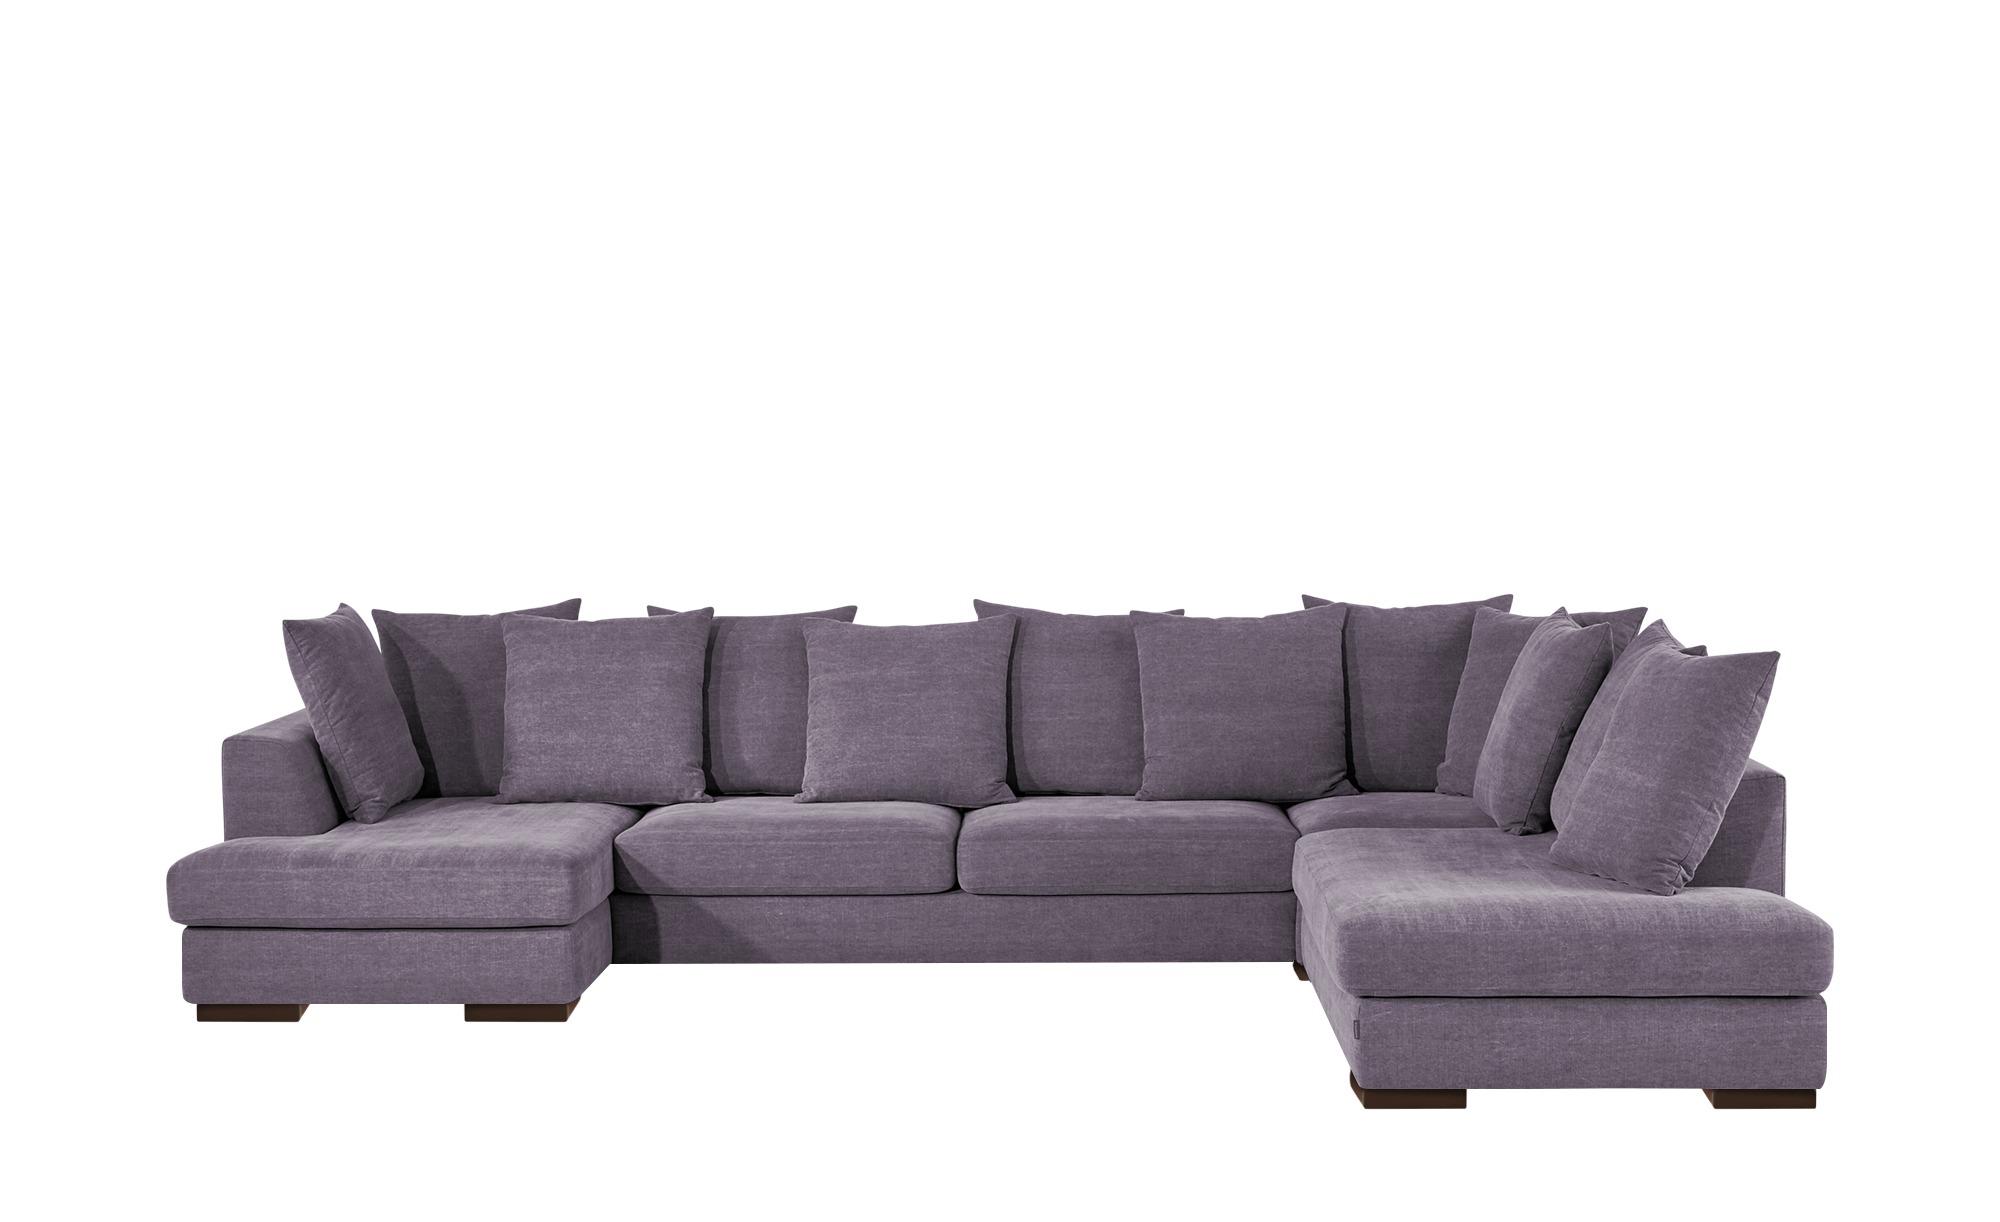 SOHO Wohnlandschaft lila - Flachgewebe Paulina ¦ lila/violett ¦ Maße (cm): B: 386 T: 258 Polstermöbel > Sofas > Wohnlandschaften - Höffner